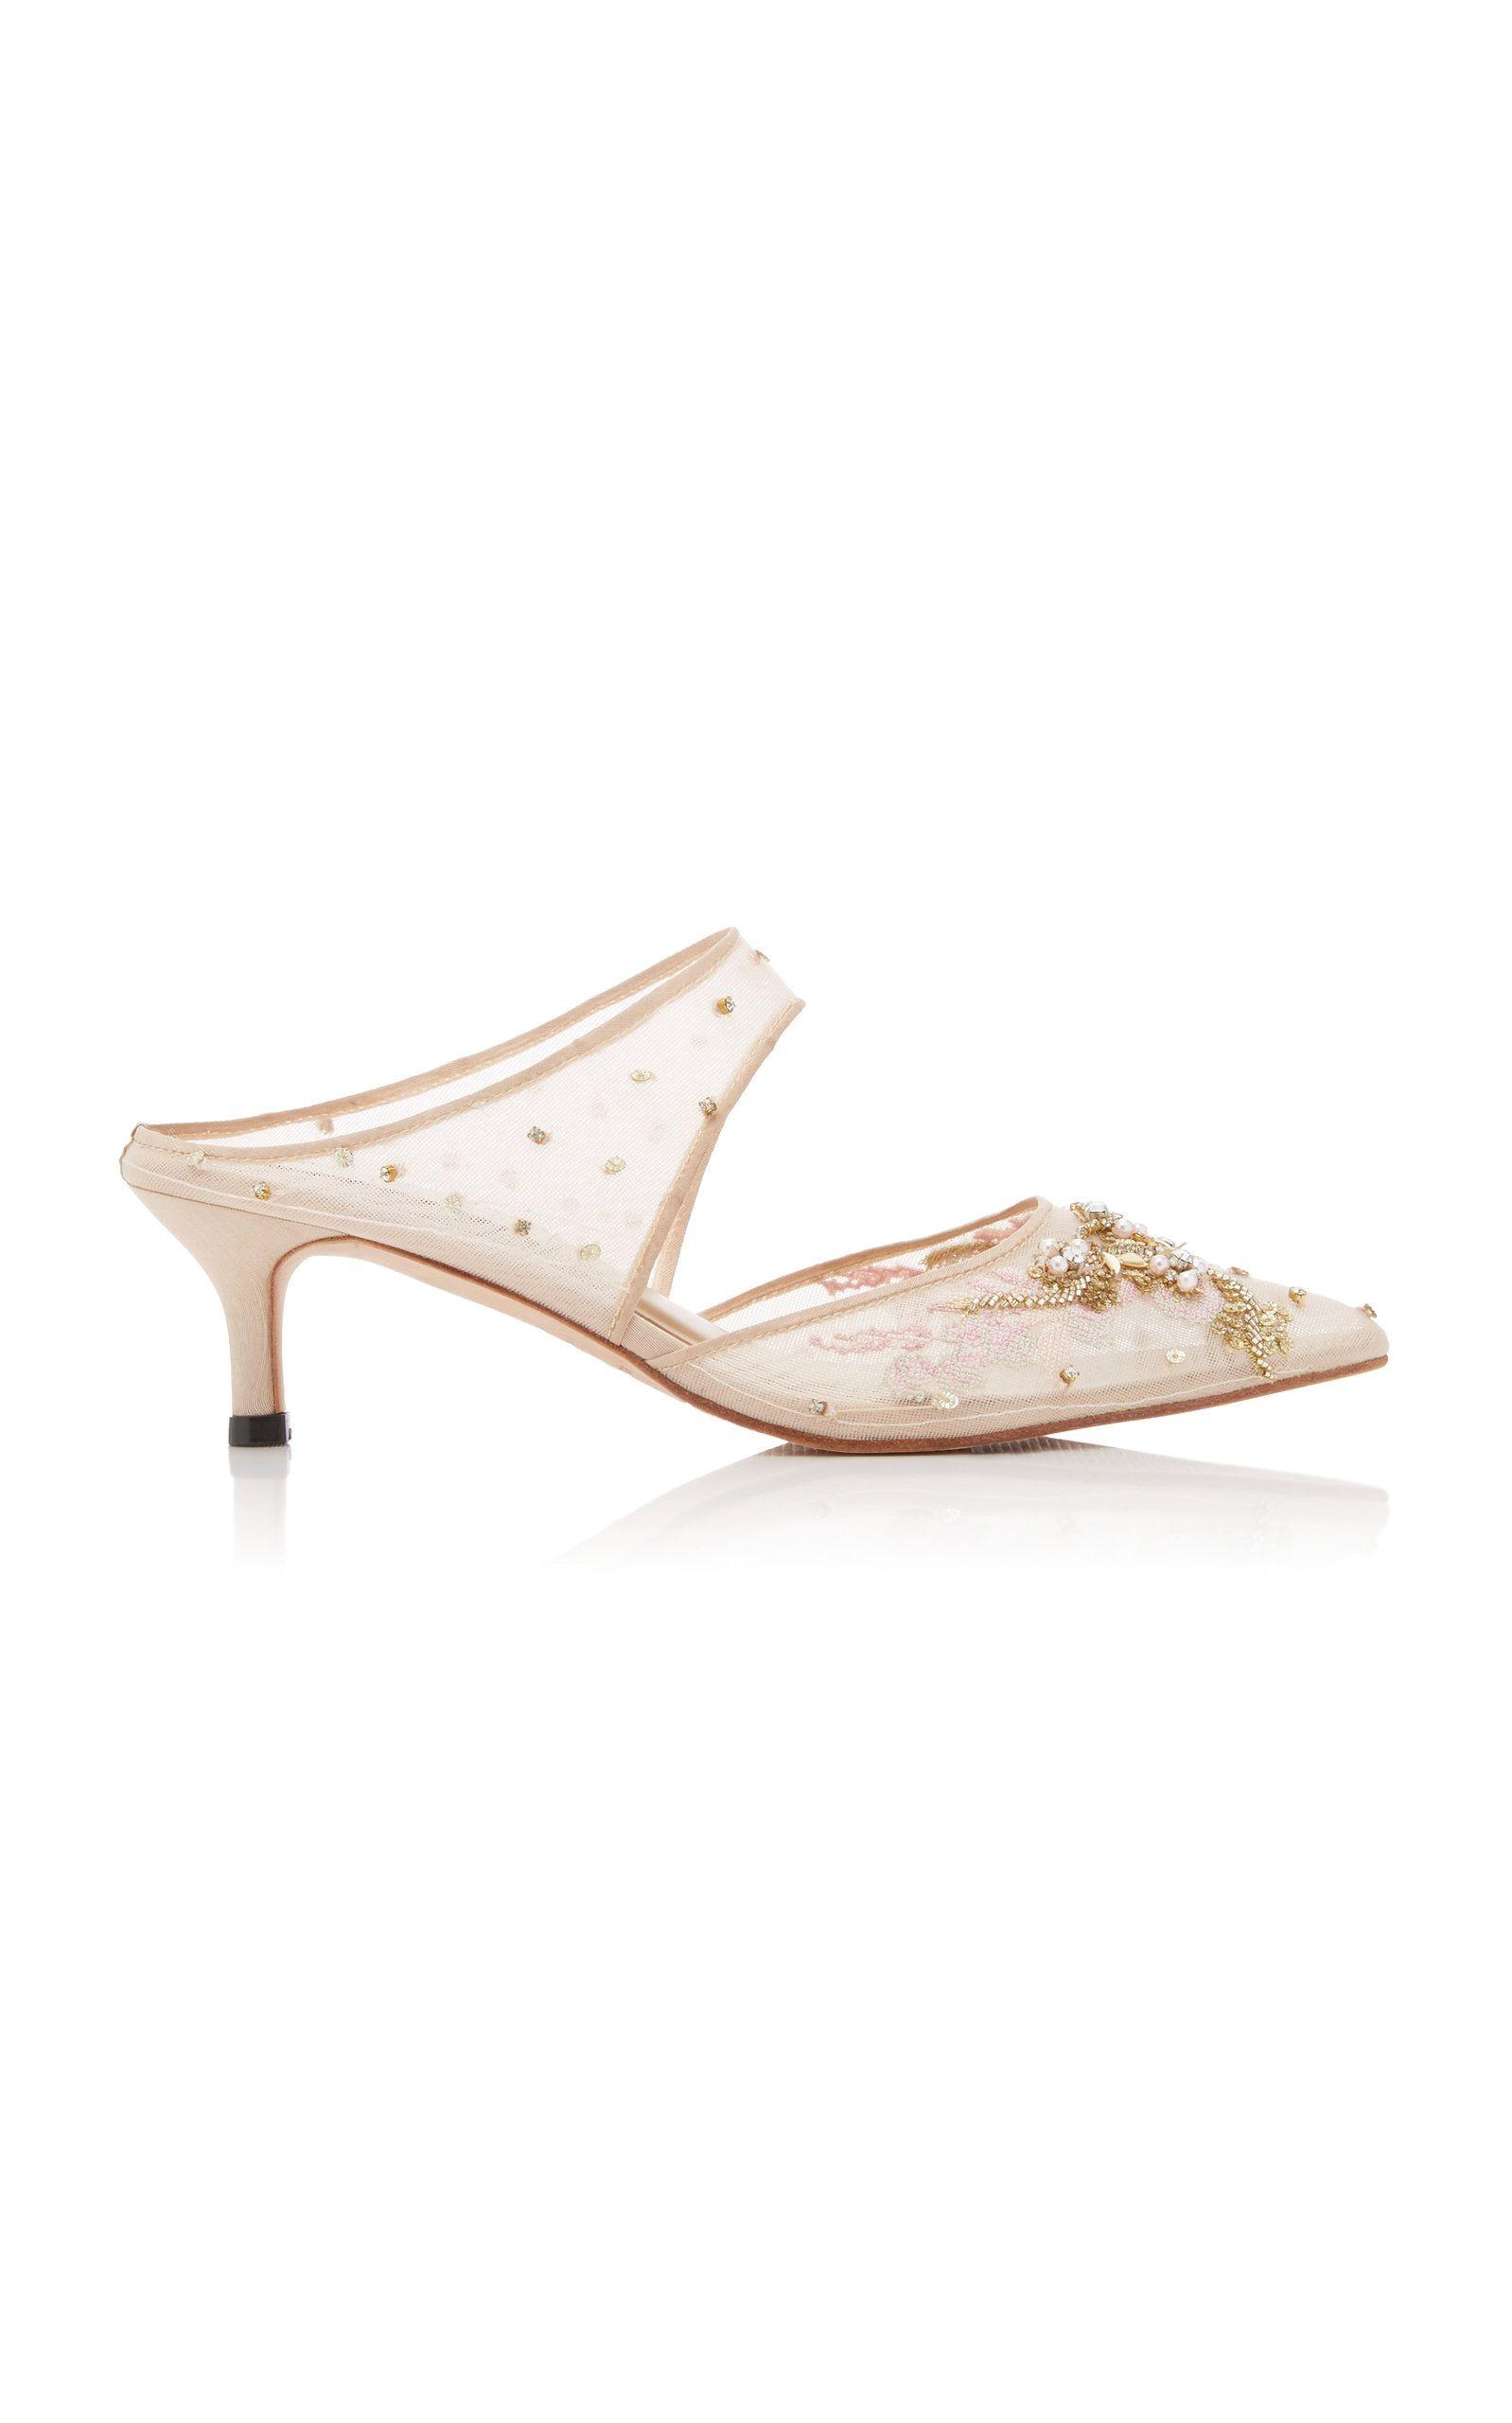 5da9ddb9781a 55 Best Wedding Shoes for 2018 - Ivory